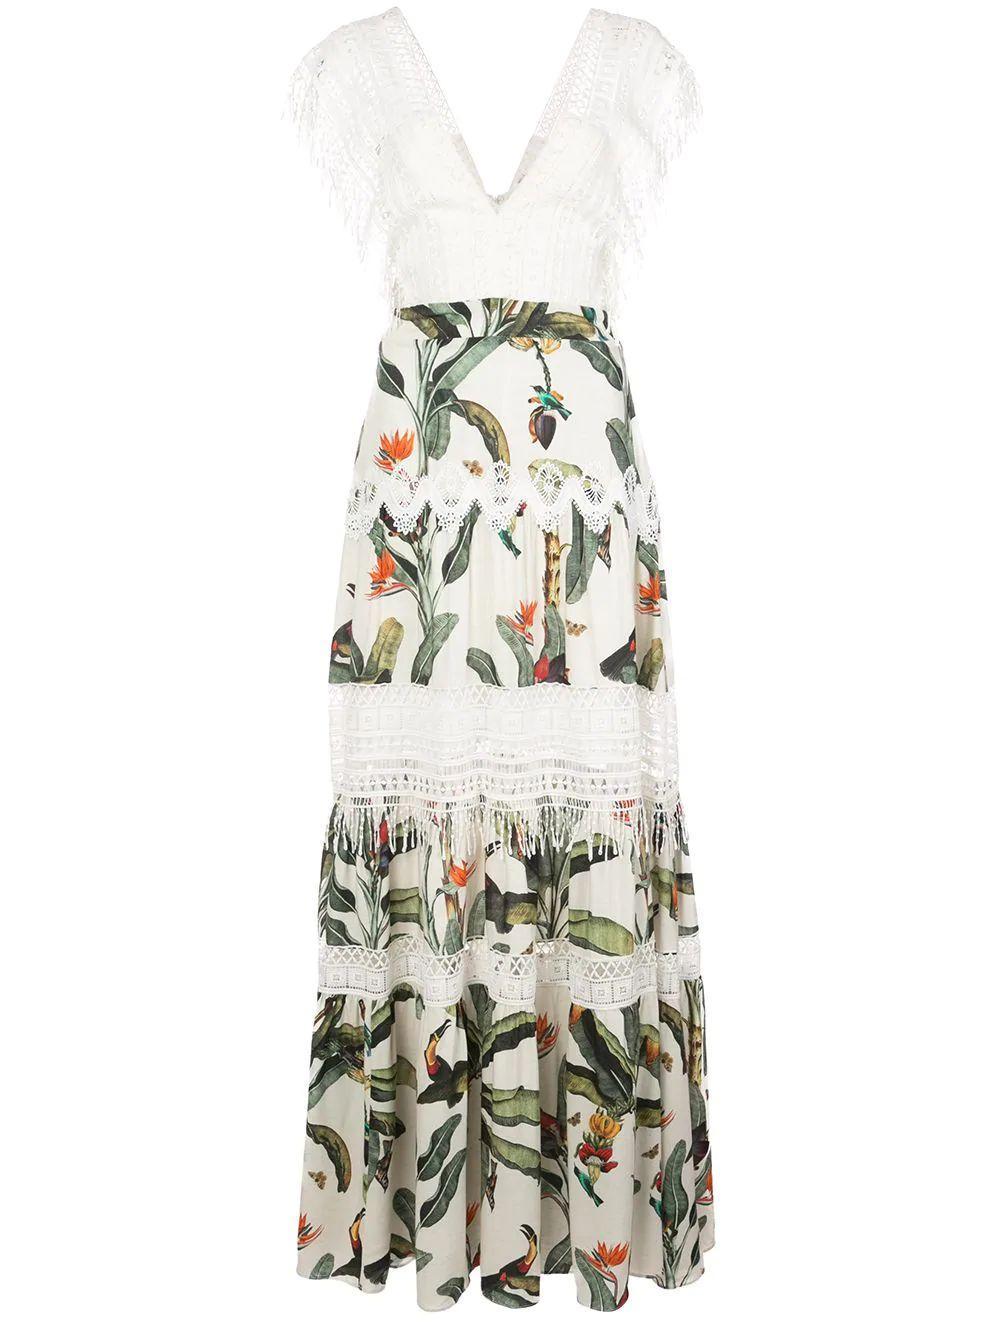 Tropical Print Lace Trim Dress